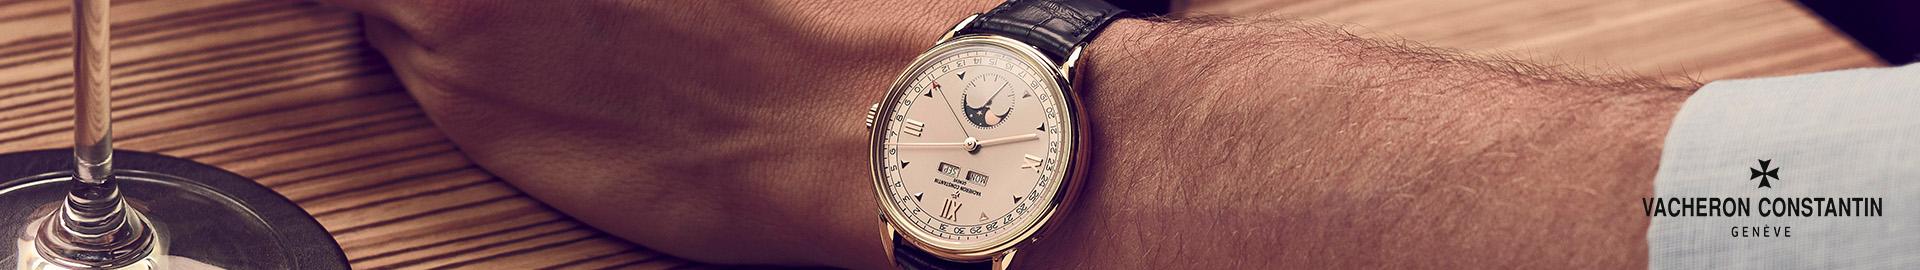 Vacheron Constantin men's watches Zazare Diamonds